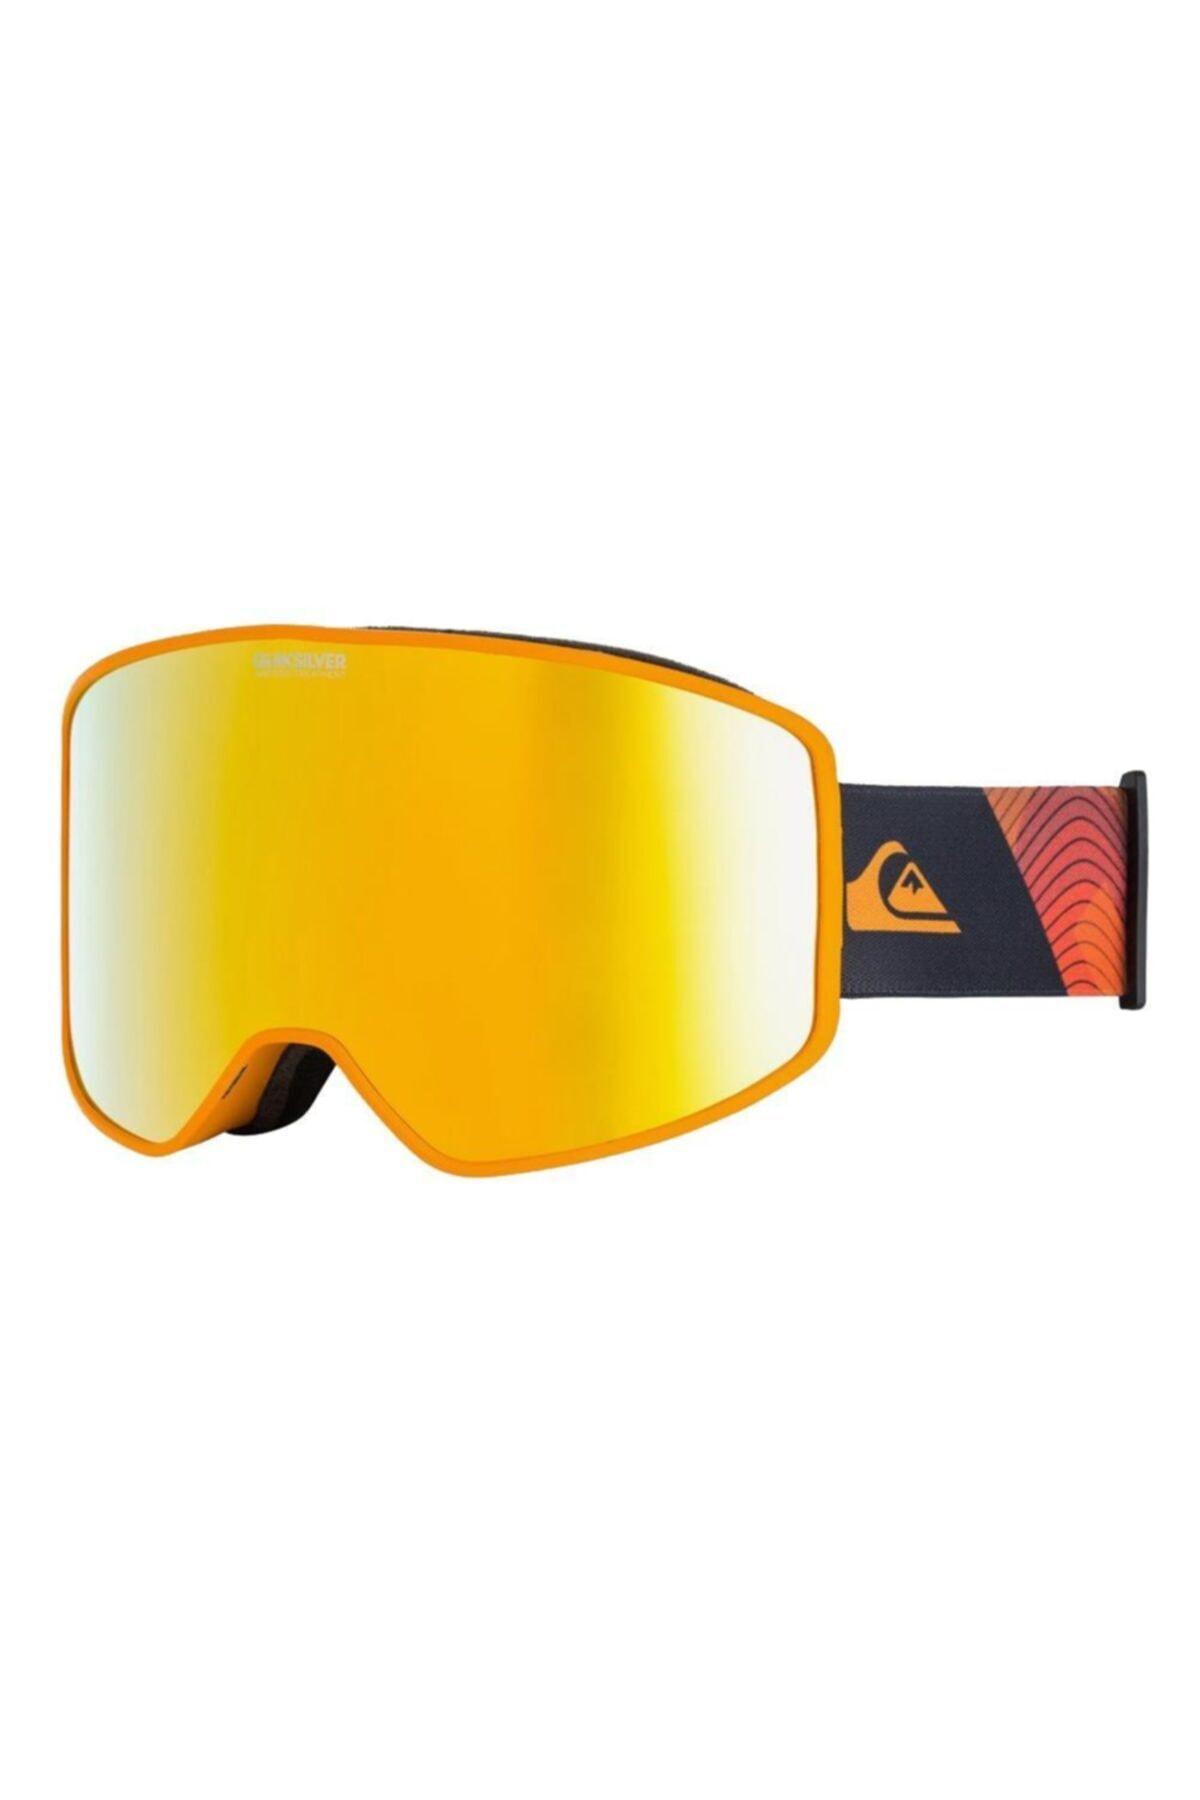 Quiksilver Storm Erkek Snowboard Gözlüğü Eqytg03099nkp0 1